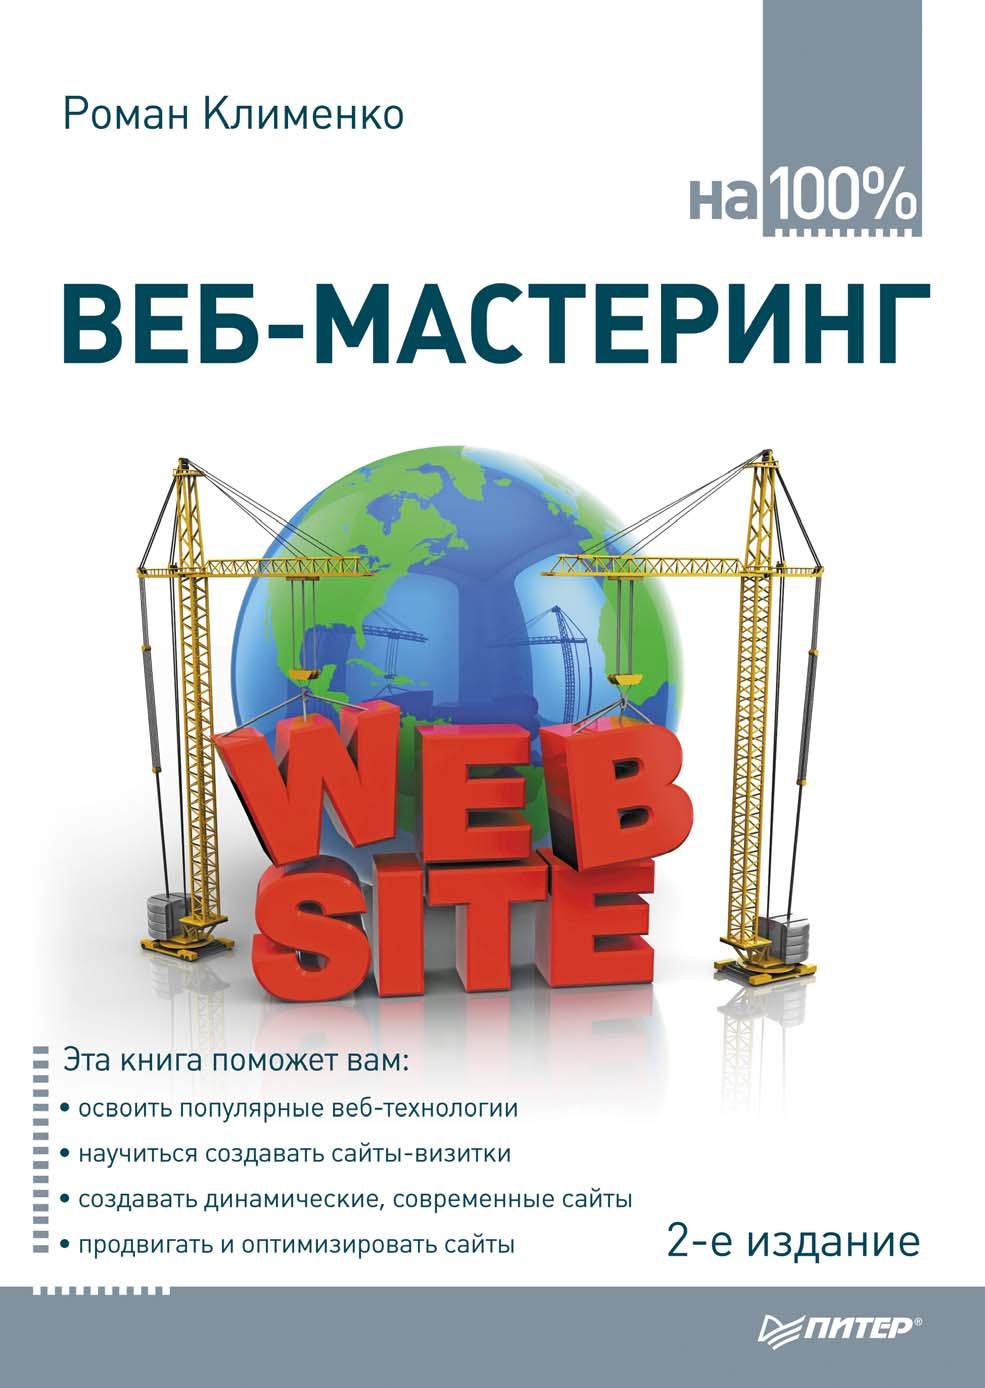 Роман Клименко Веб-мастеринг на 100%